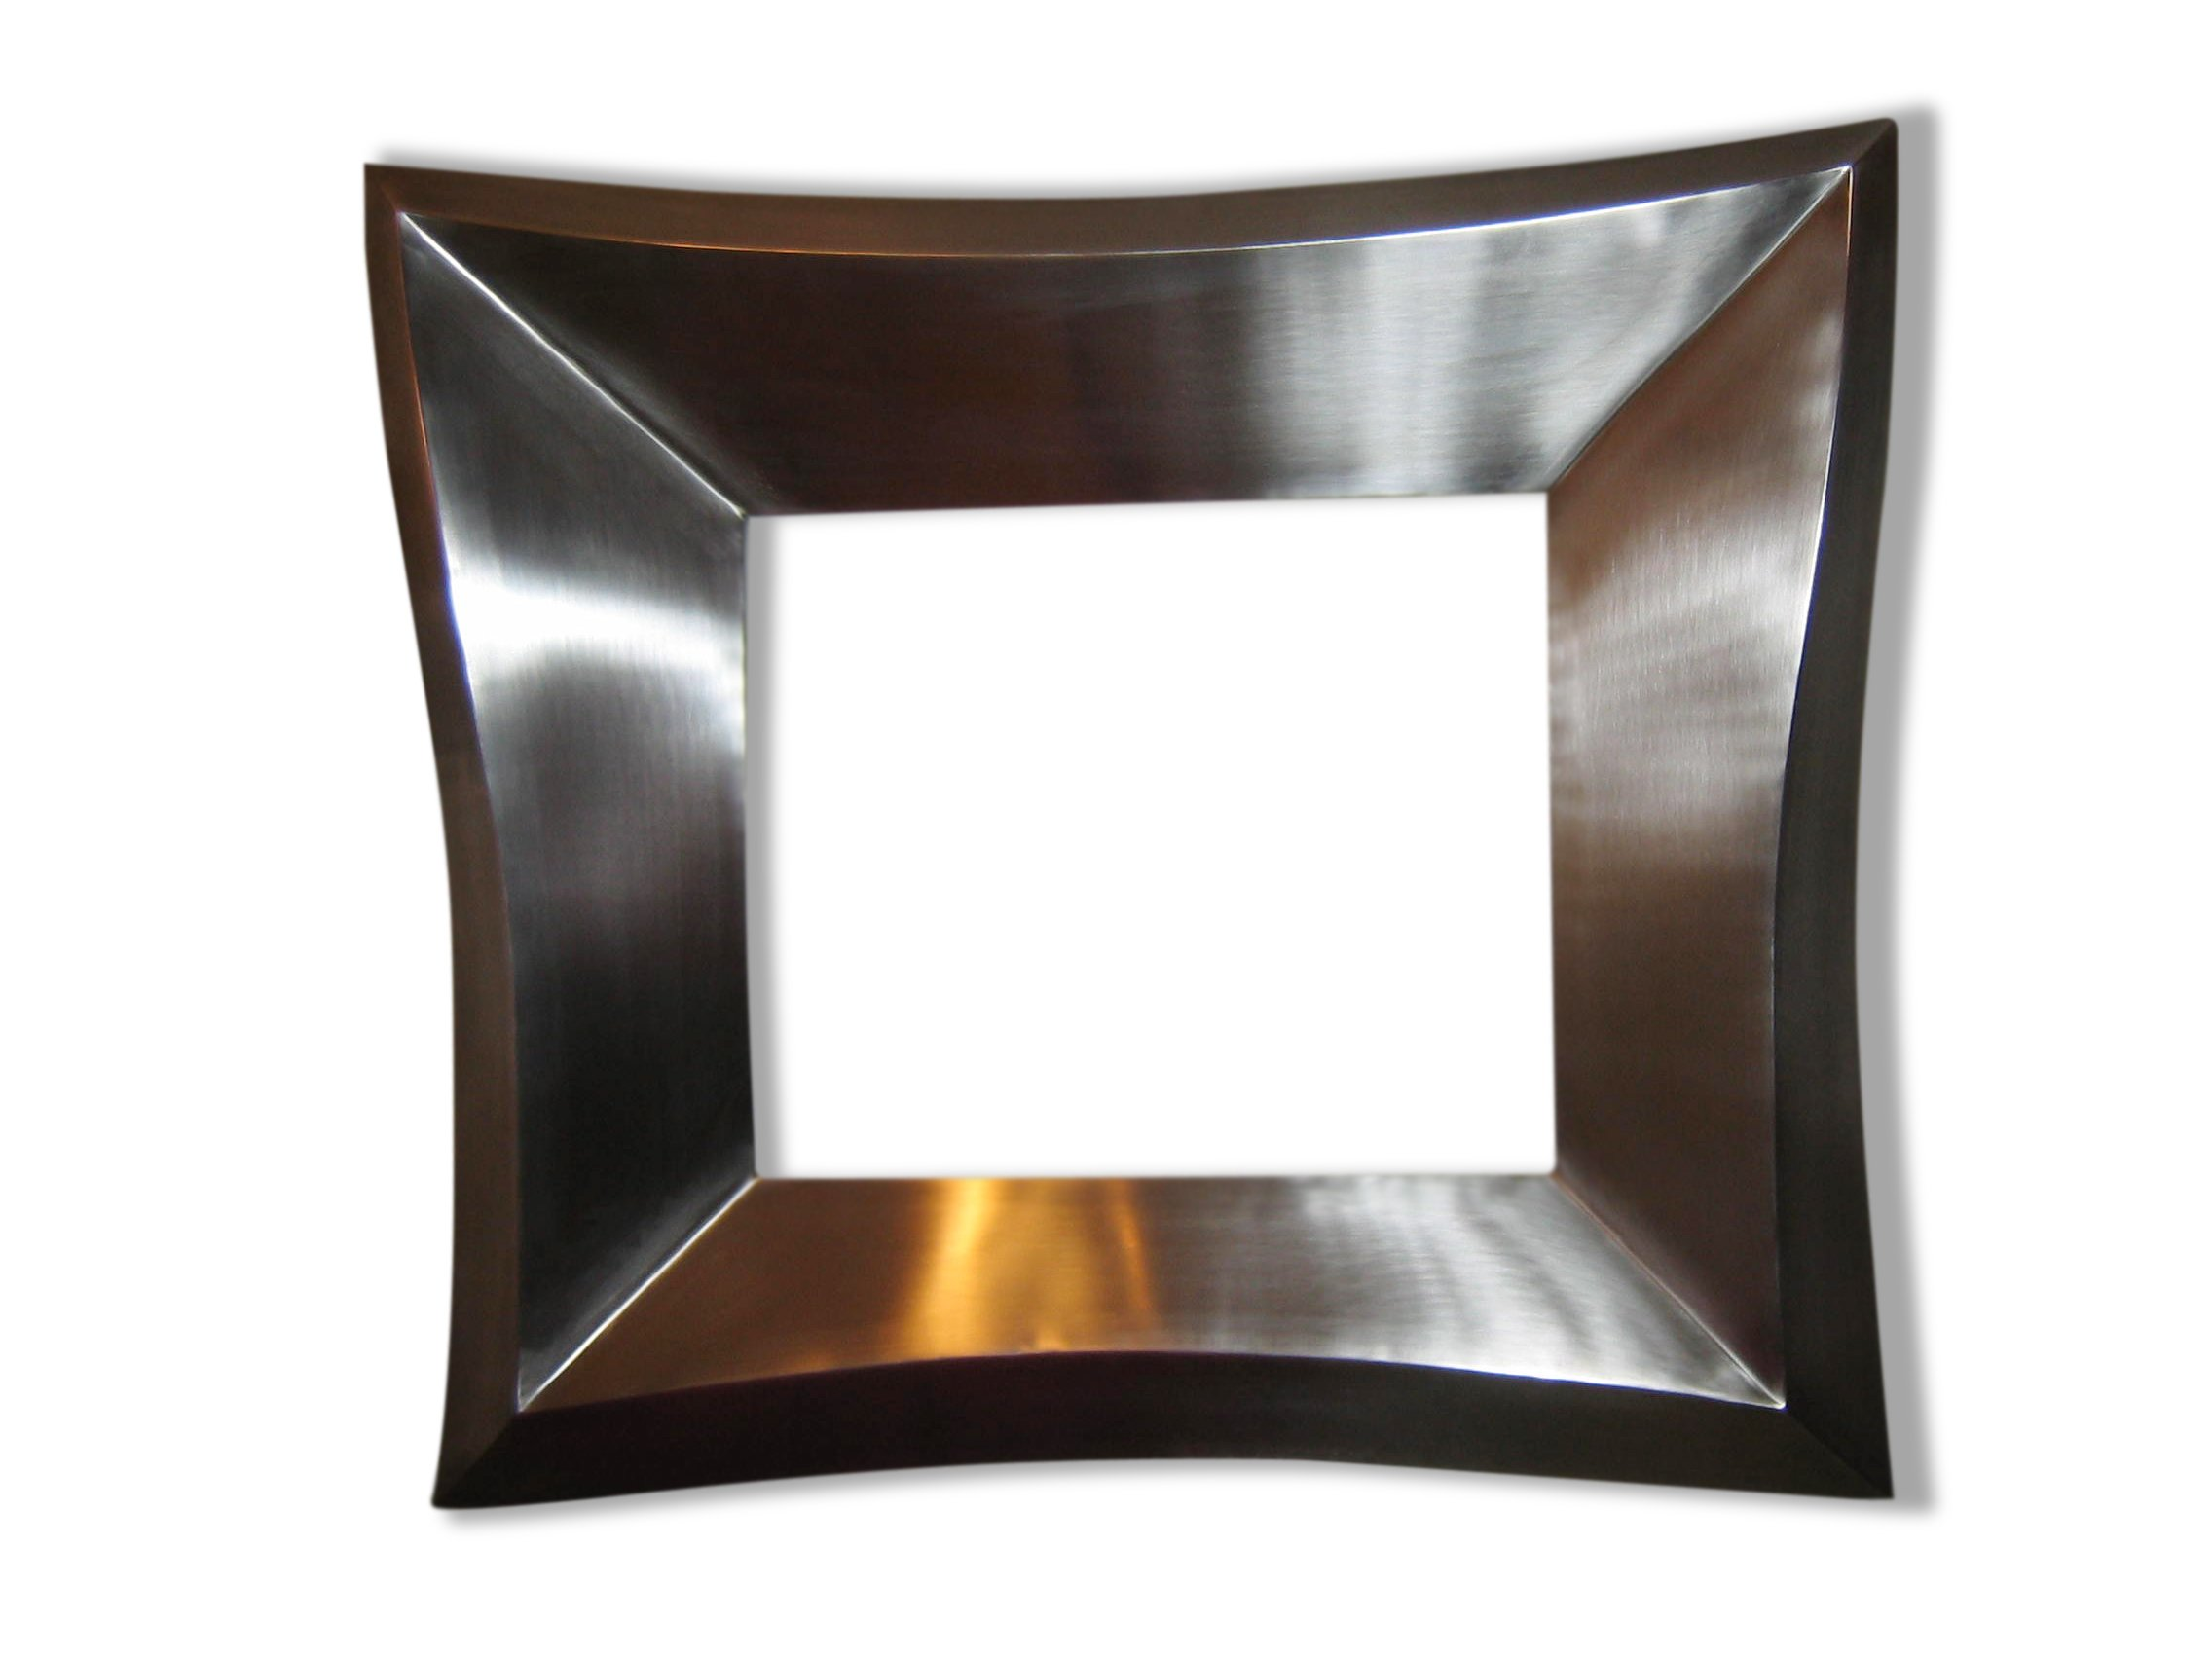 miroir carr avec cadre marco by ici et l design ici et l barcelona. Black Bedroom Furniture Sets. Home Design Ideas